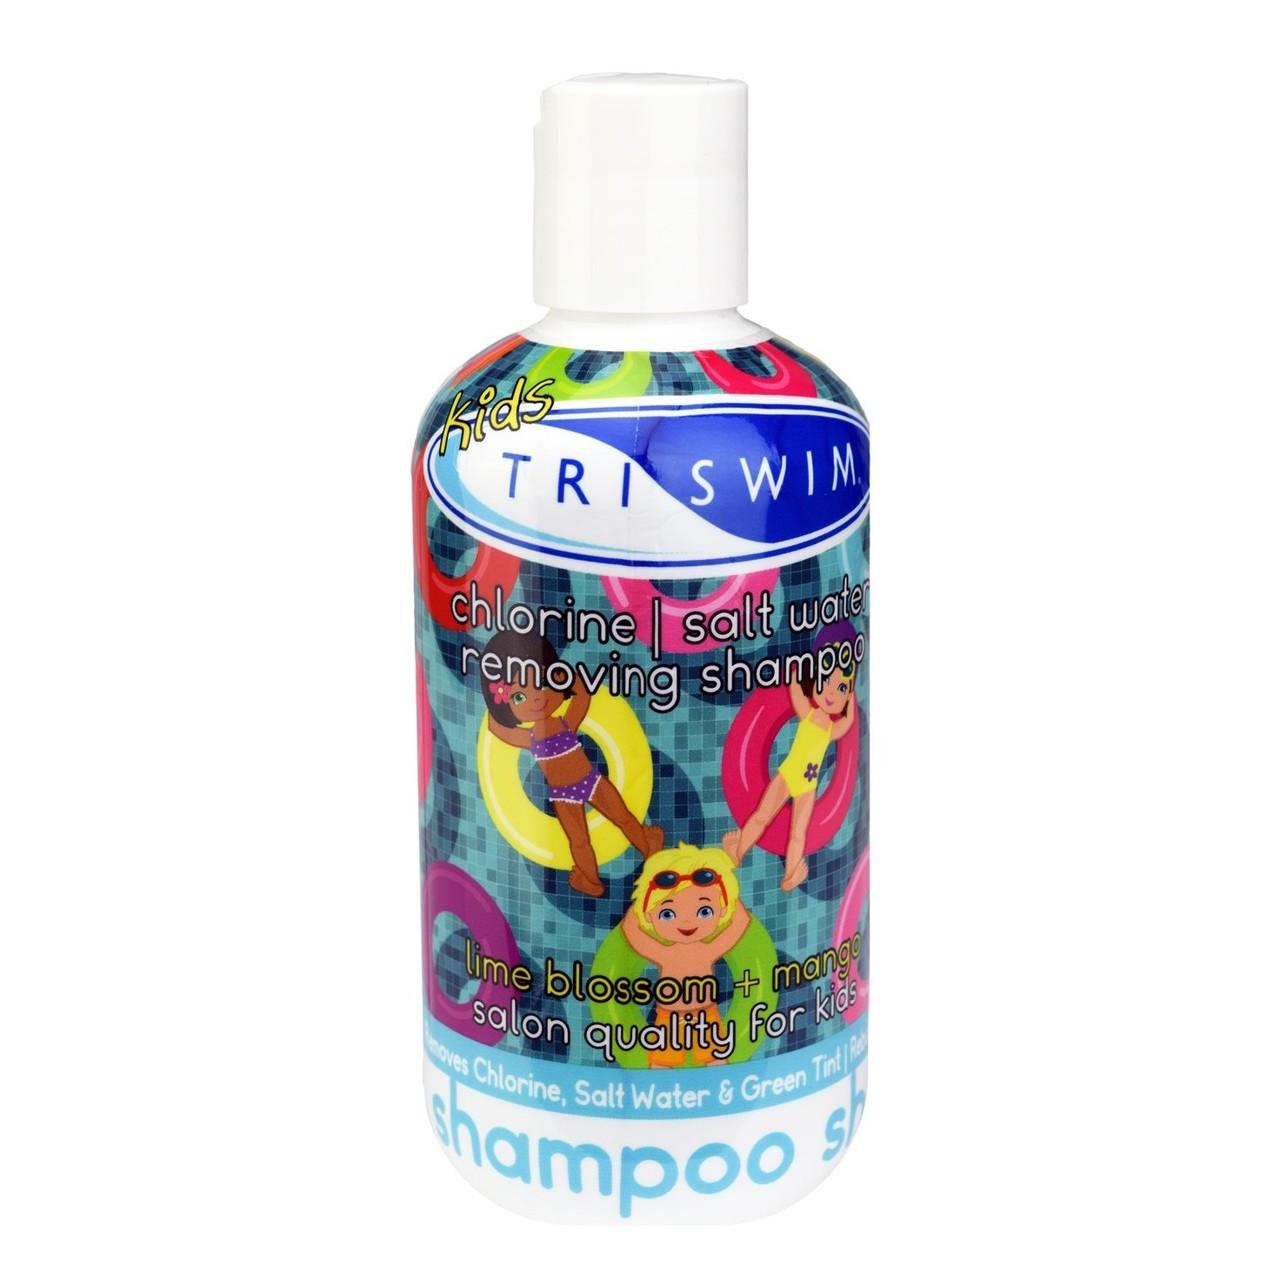 TriSwim Kids Chlorine Removal Shampoo - 8.5 oz. - 2019 price